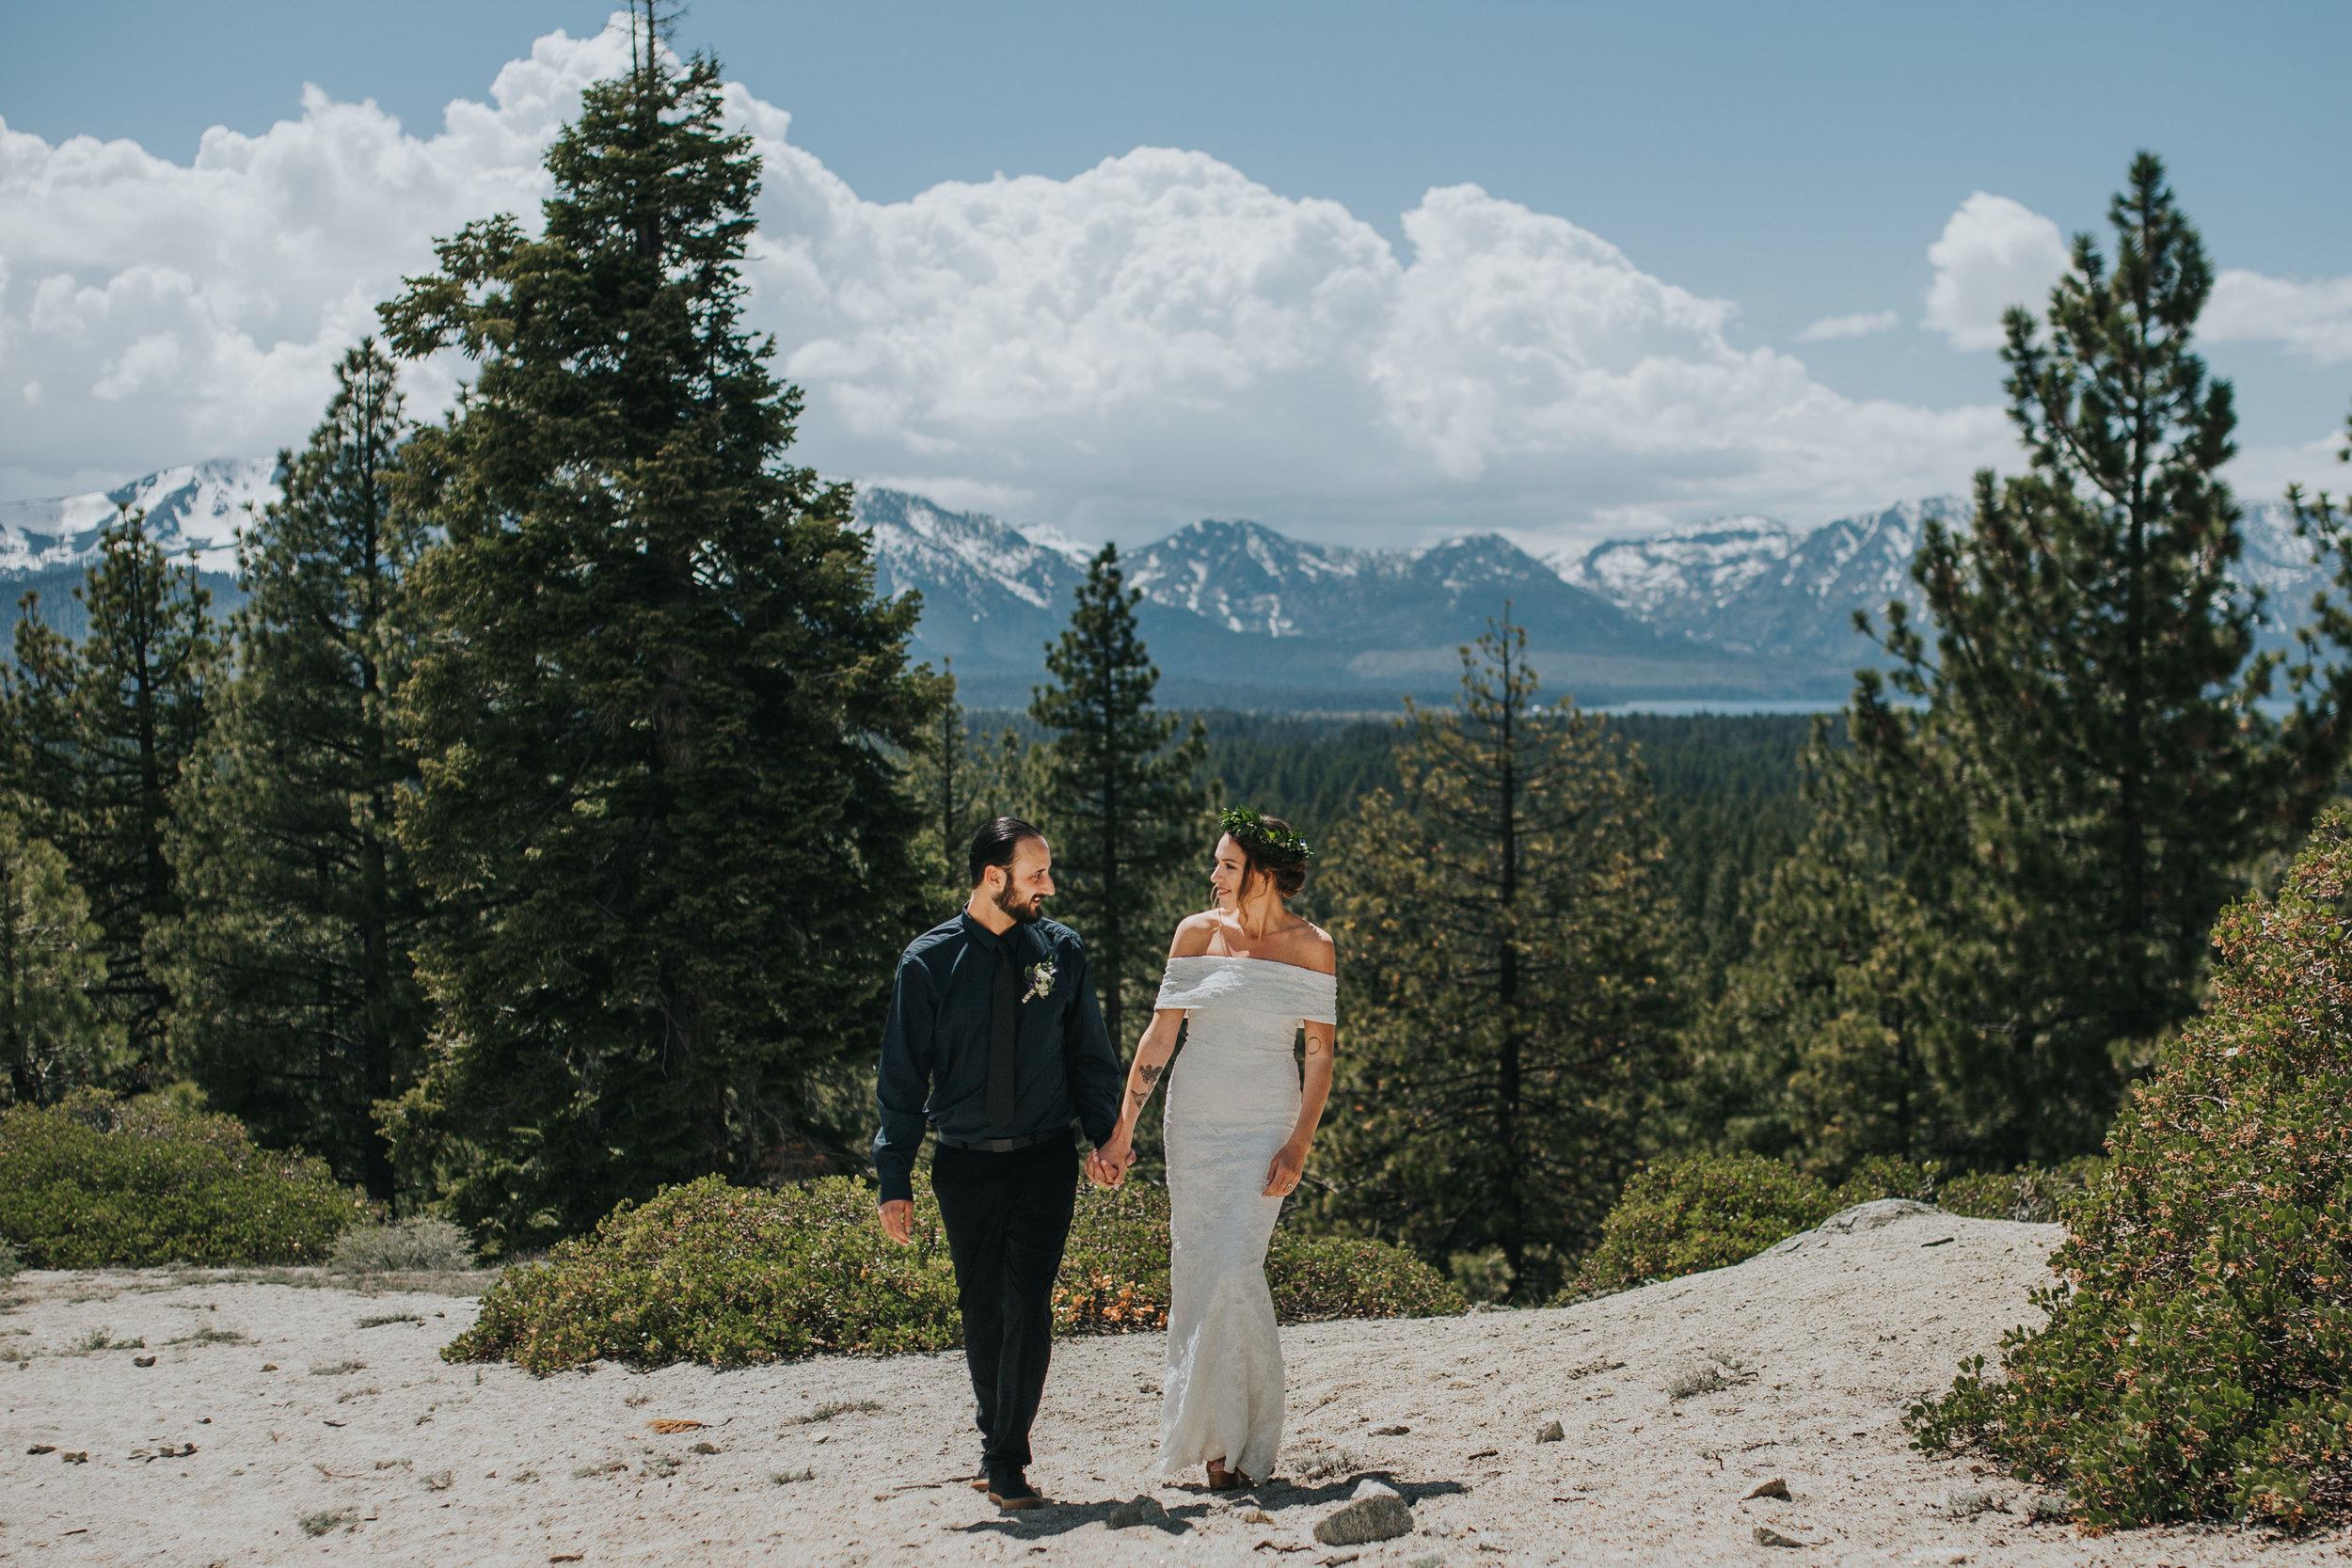 south-lake-tahoe-elopement-valerie-lendvay-photo-021.jpg